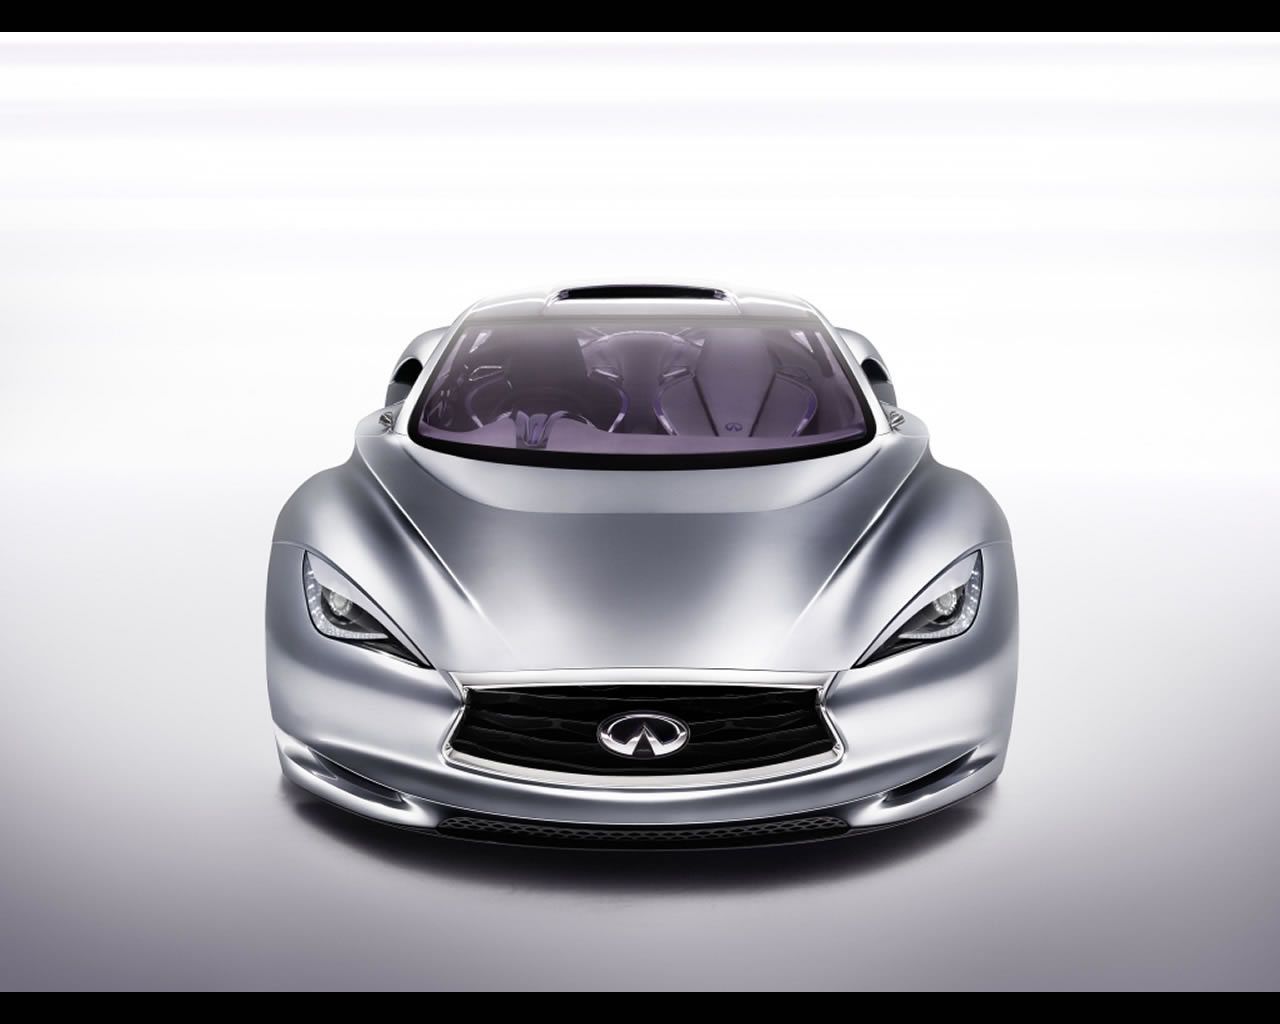 Infiniti Emerg E Range Extended Electric Sports Car Concept 2012